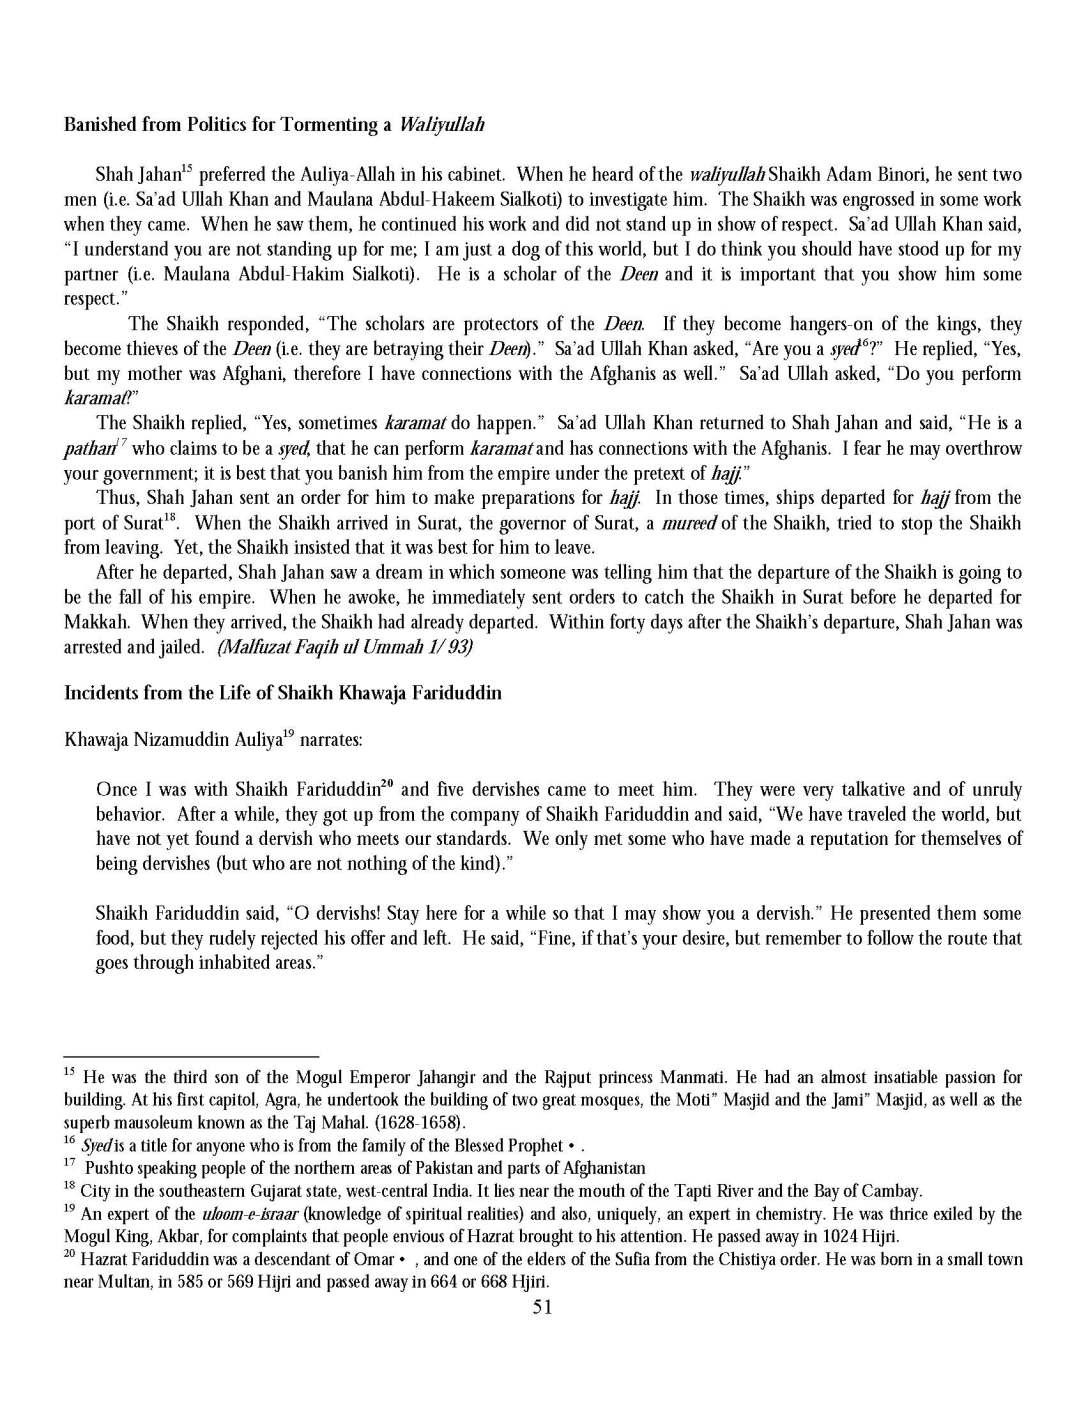 ConsequencesOfDebasingAuliyaAllah_Page_52